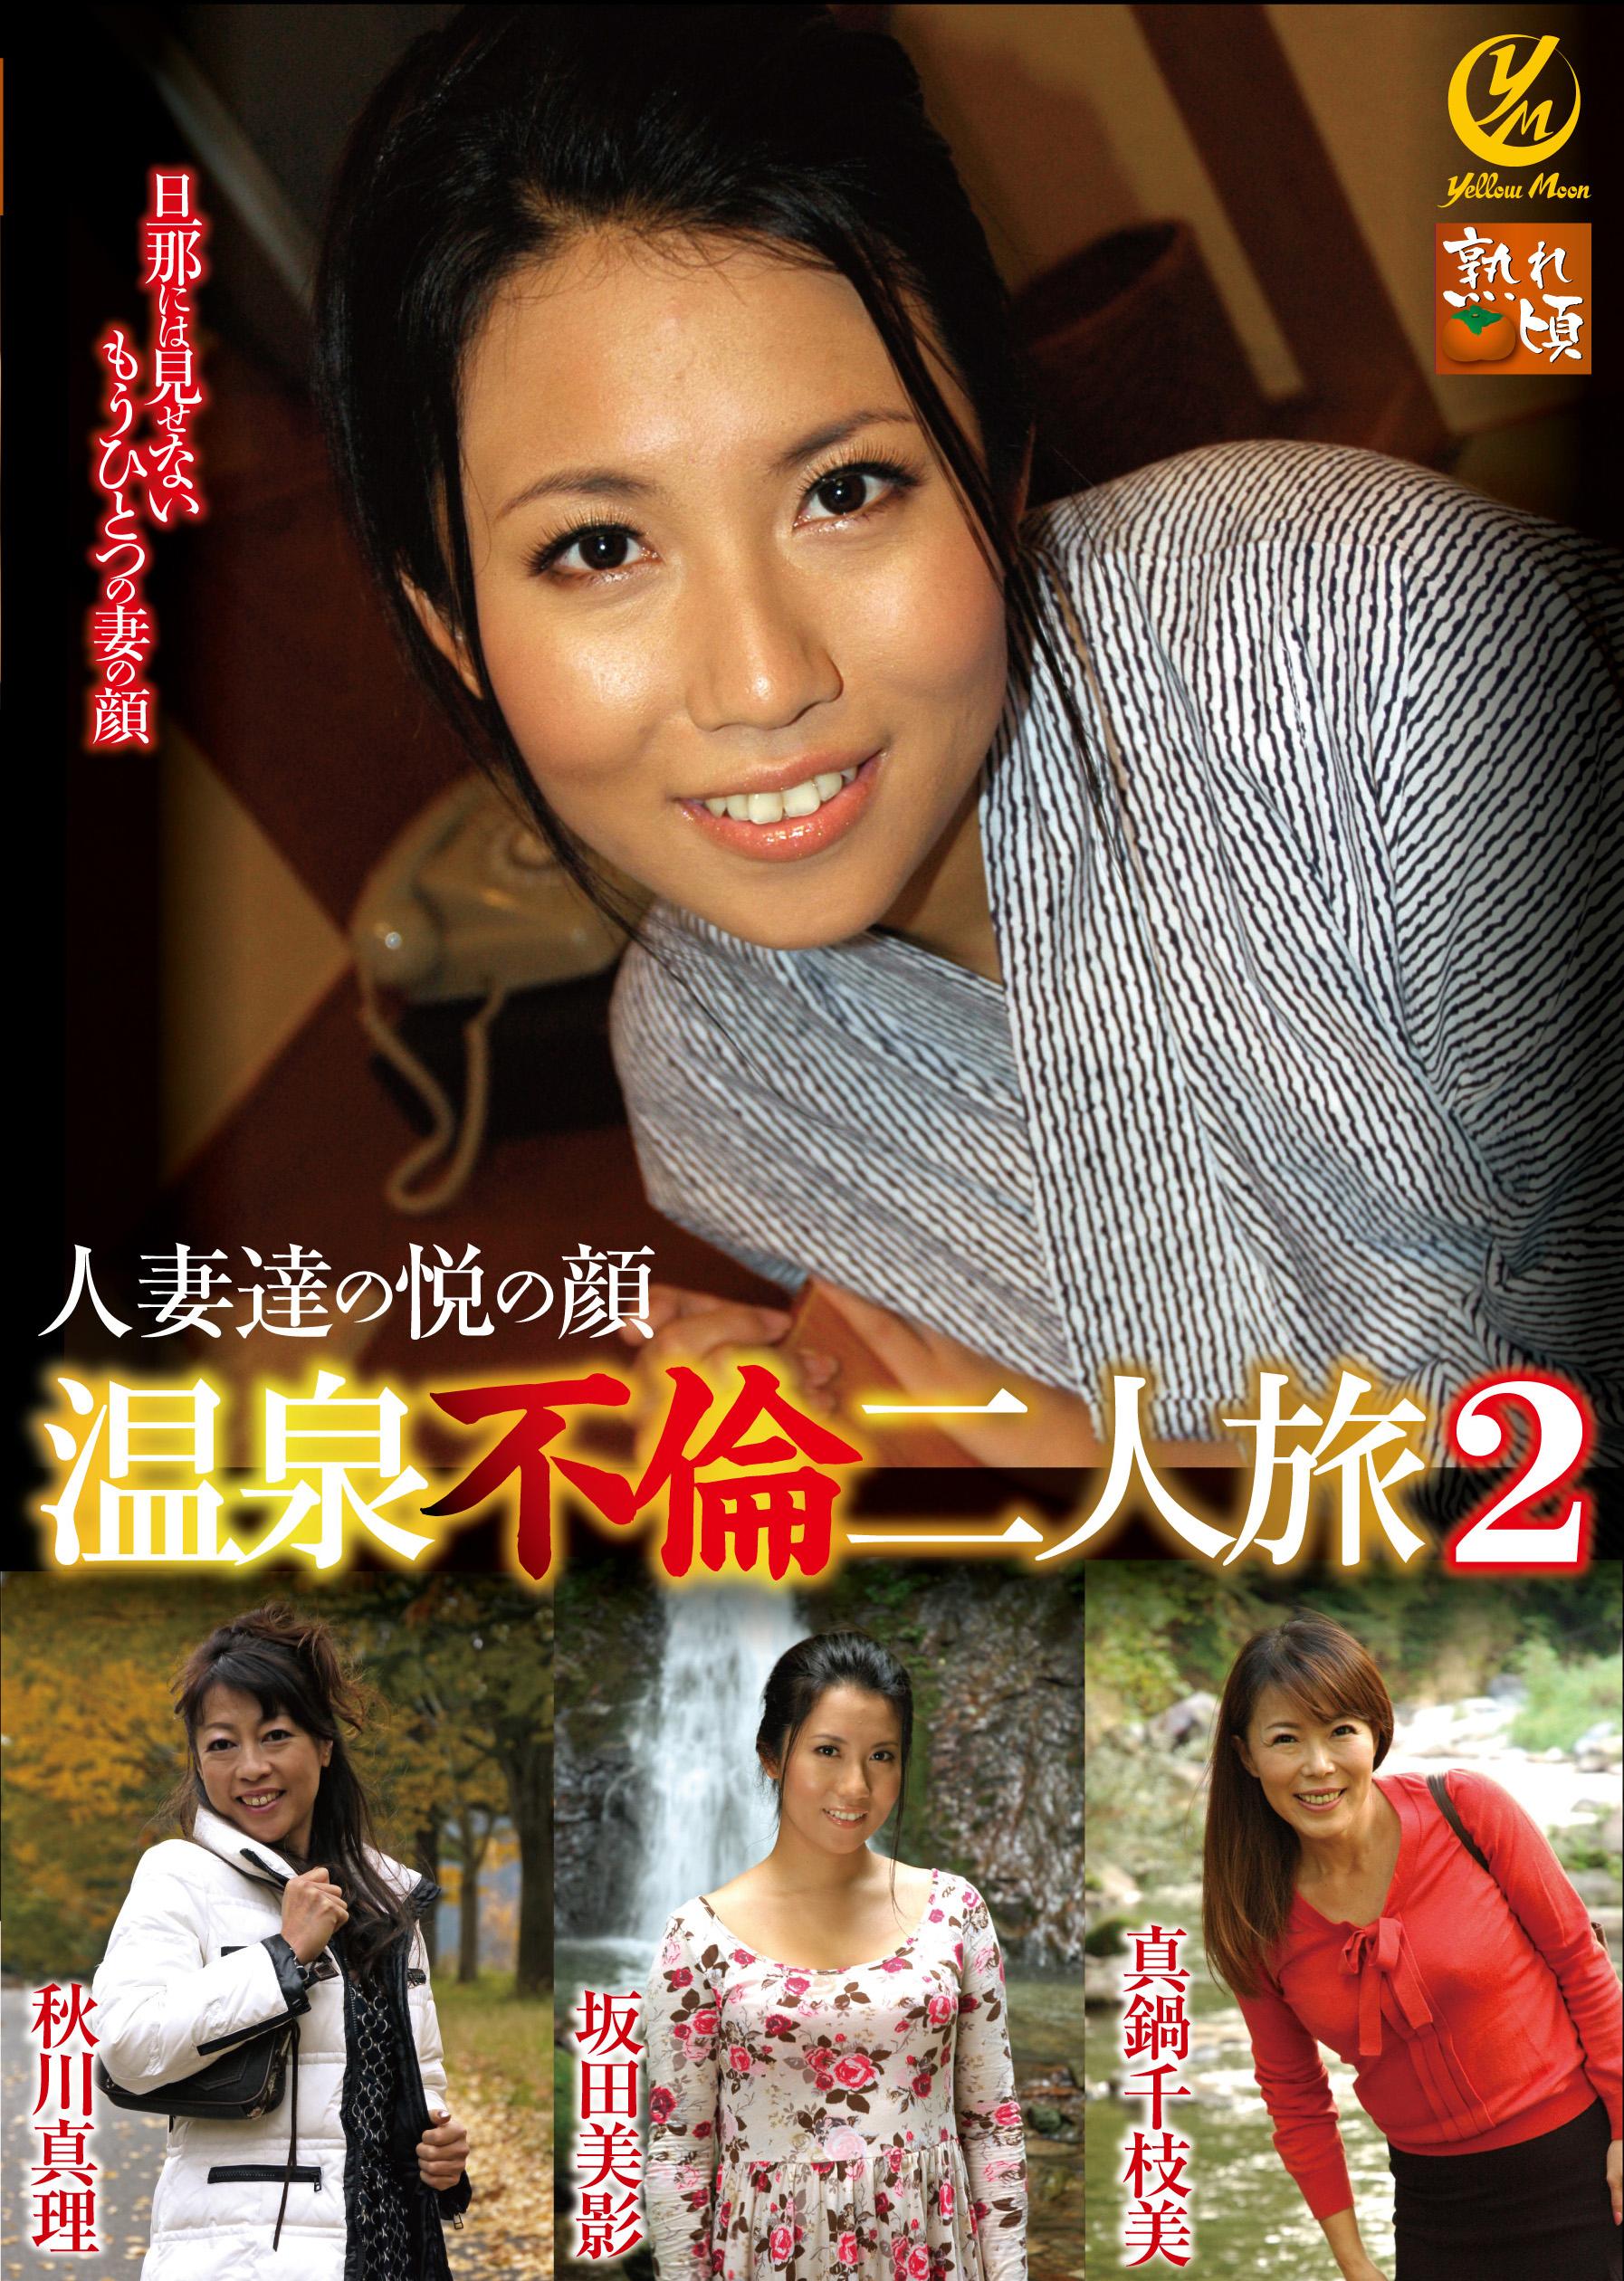 YLW_JK_4379